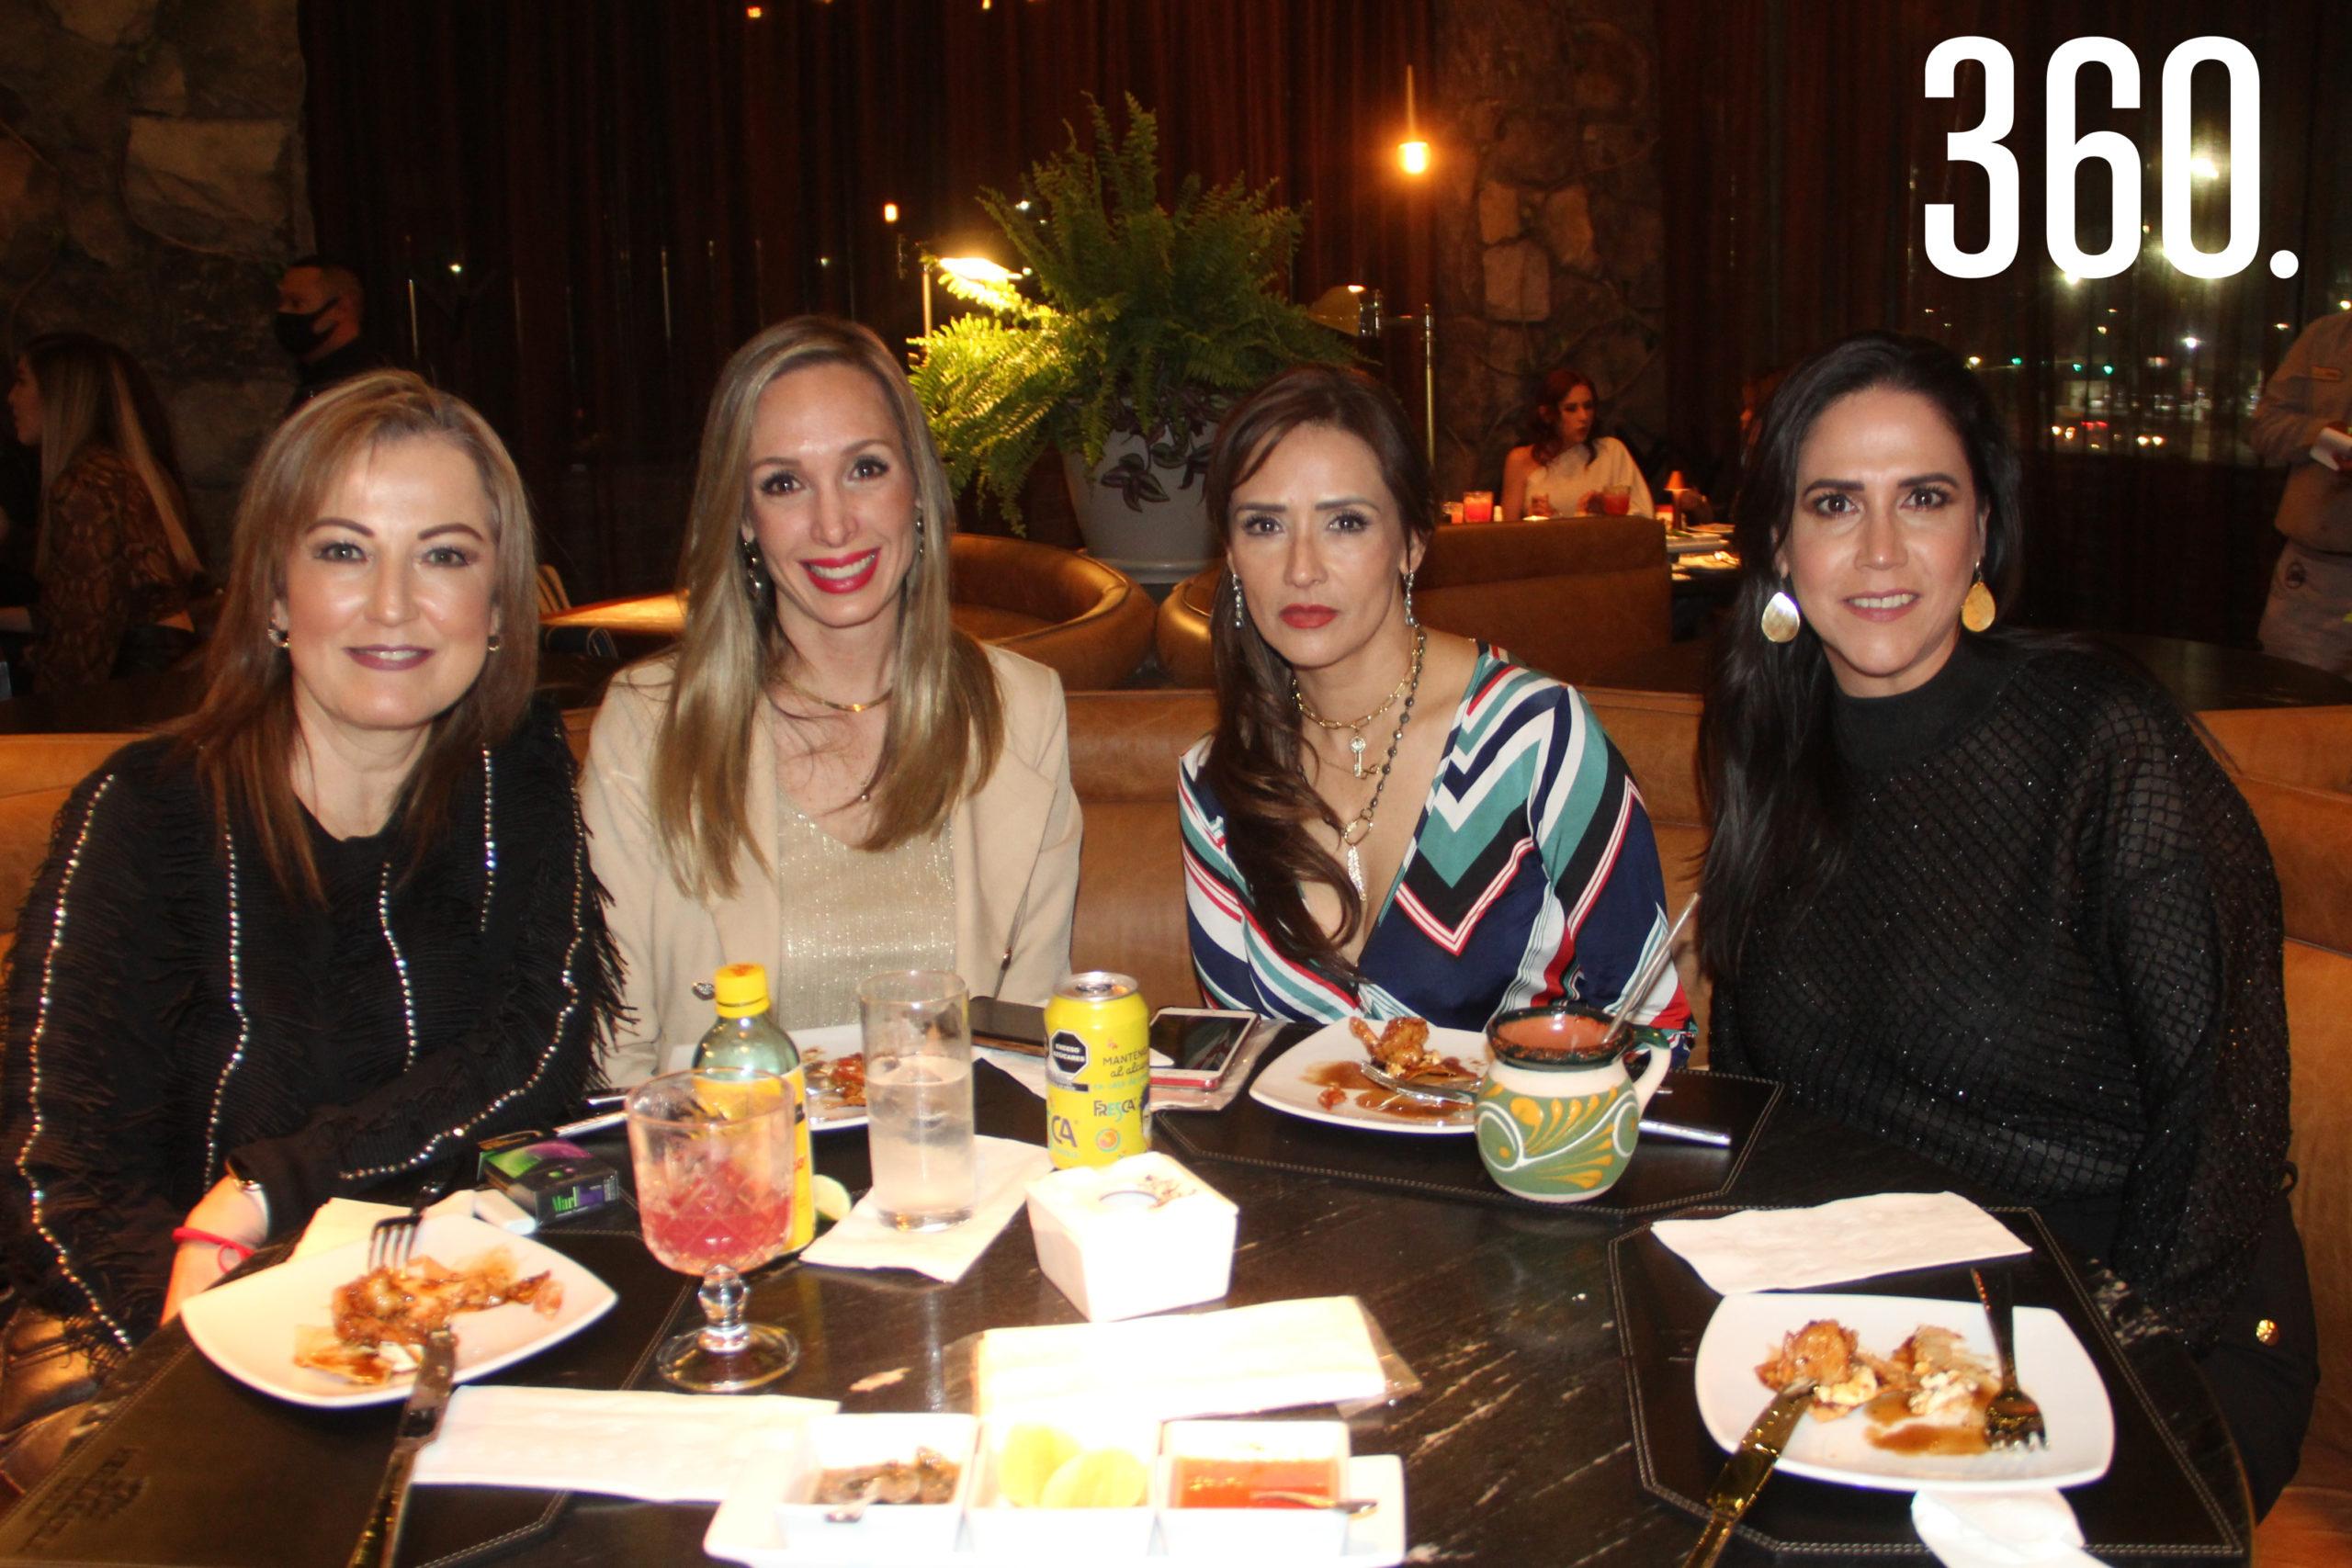 Dora María Galindo, Mónica Ribé, Loyda Gil y Ana Mireya García.